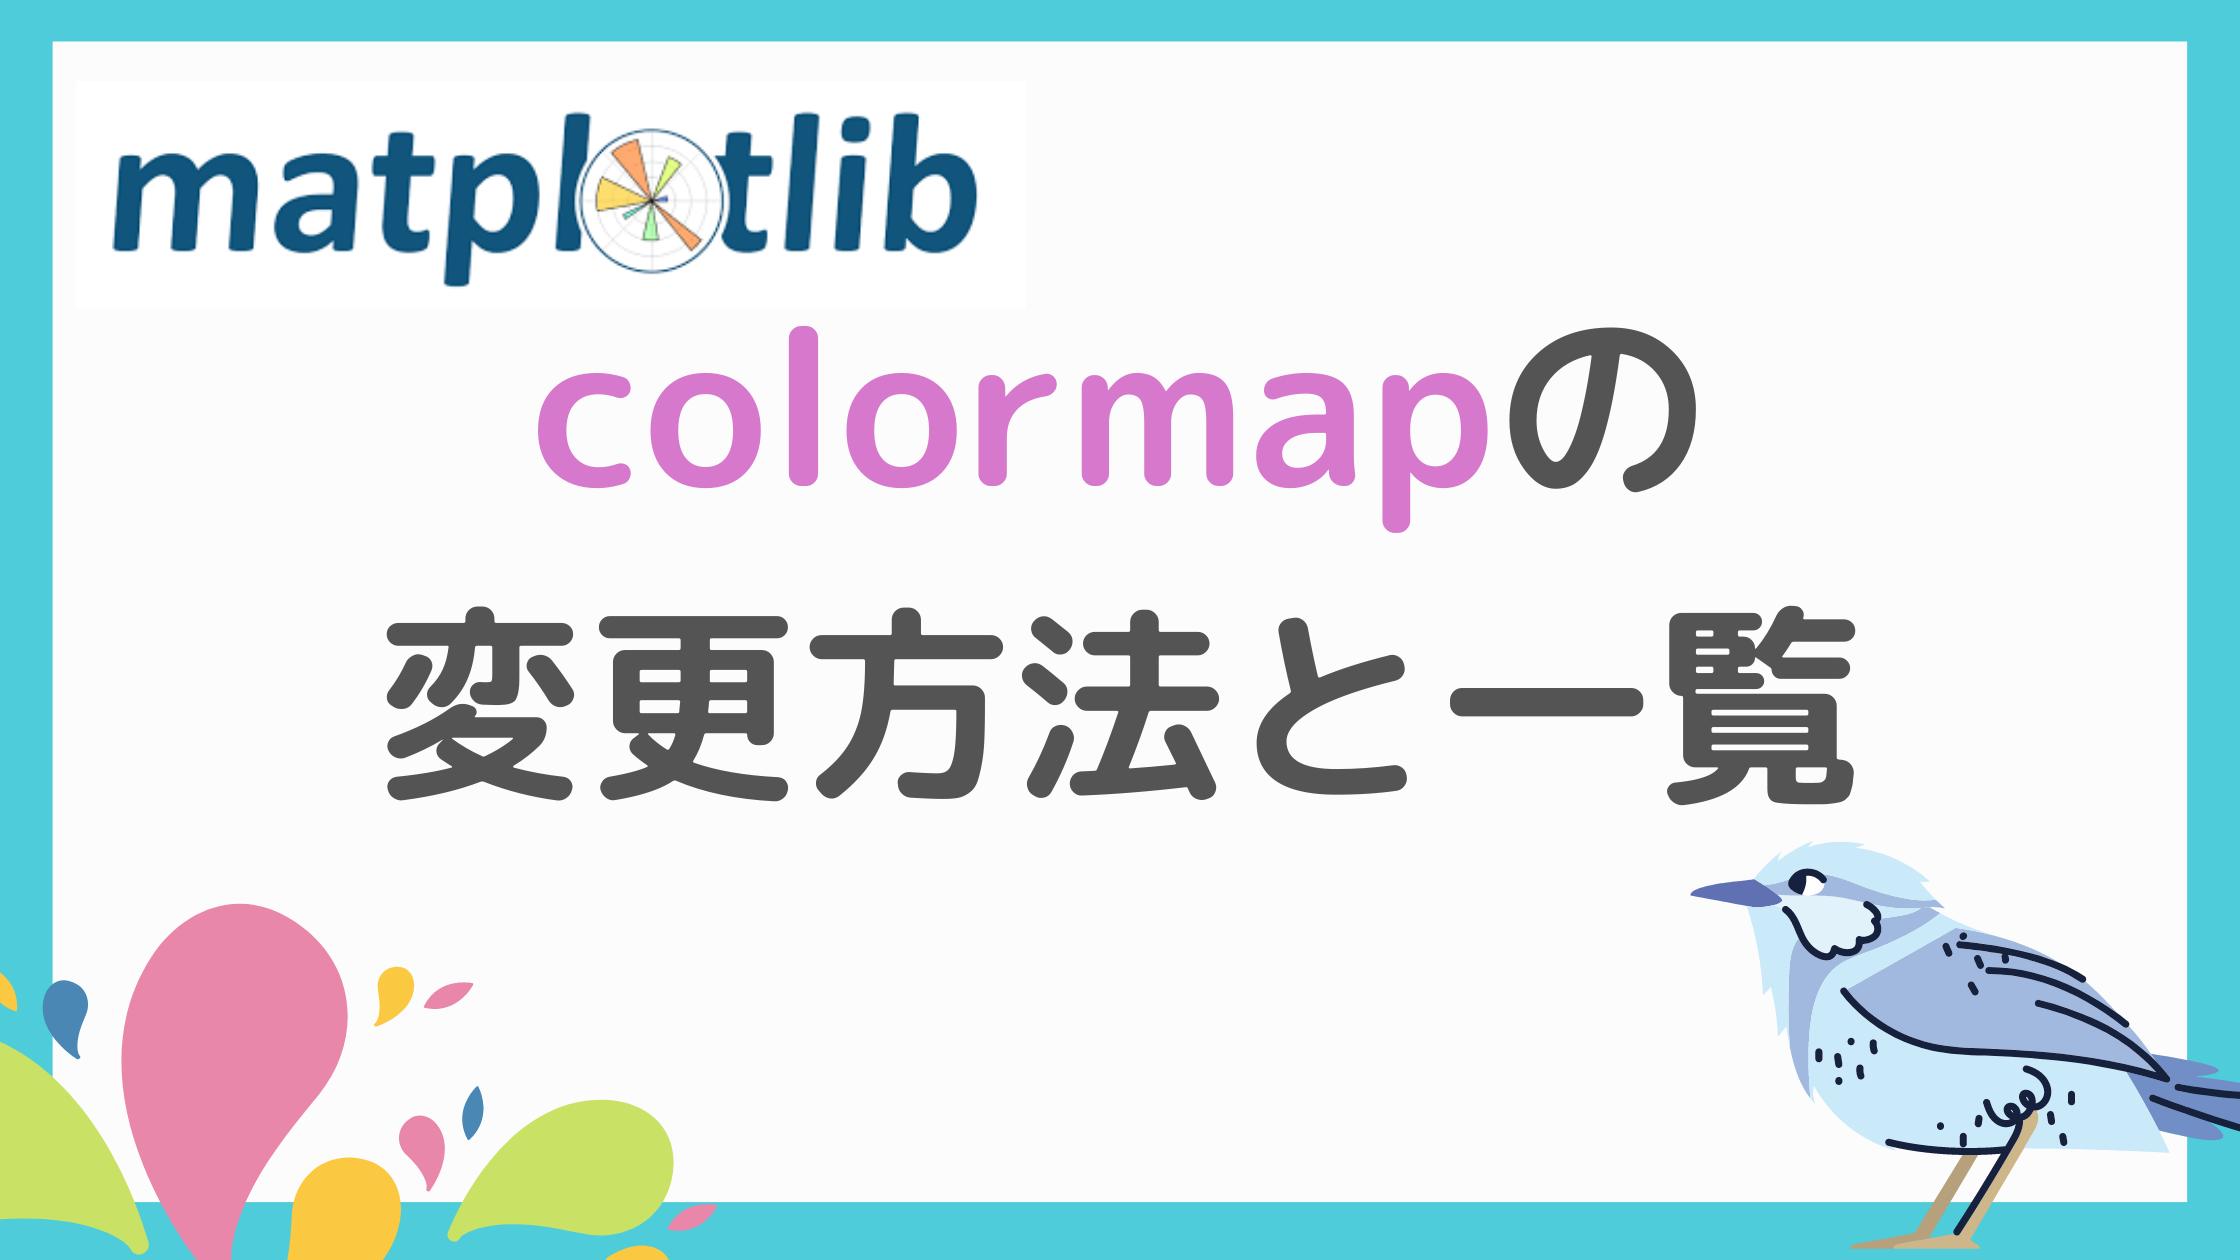 matplotlibのcolormapの記事のアイキャッチ